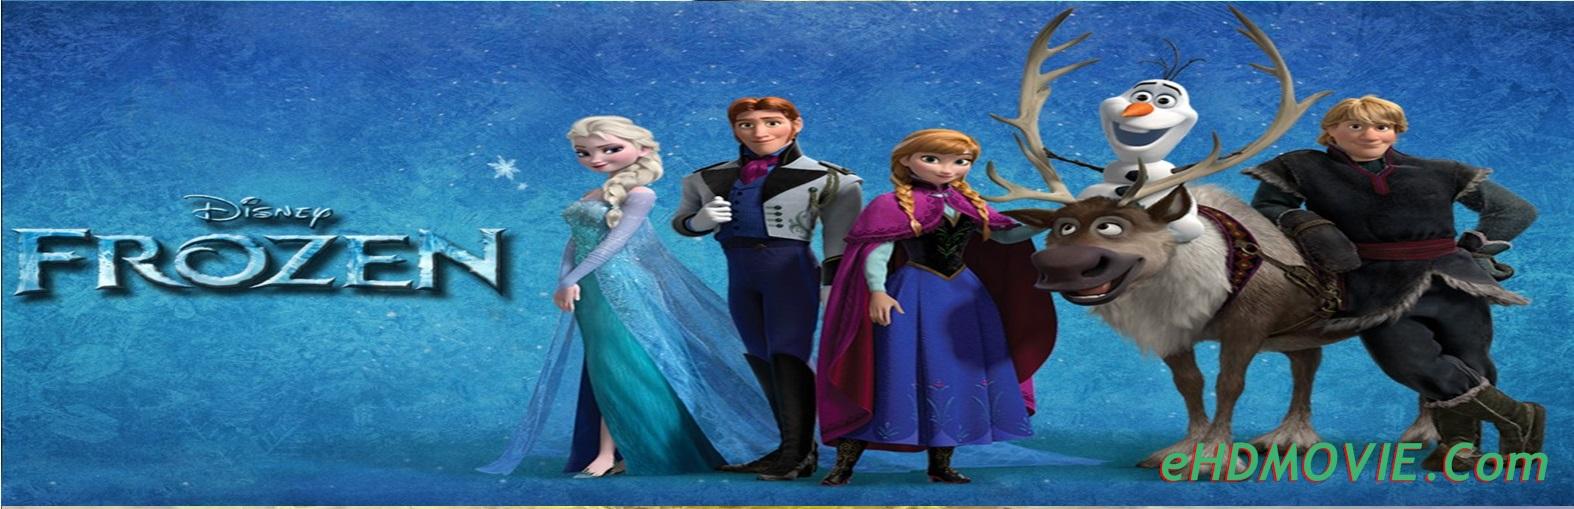 Frozen 2013 Full Movie Dual Audio [Hindi – English] 720p - 480p ORG BRRip 350MB - 950MB ESubs Free Download